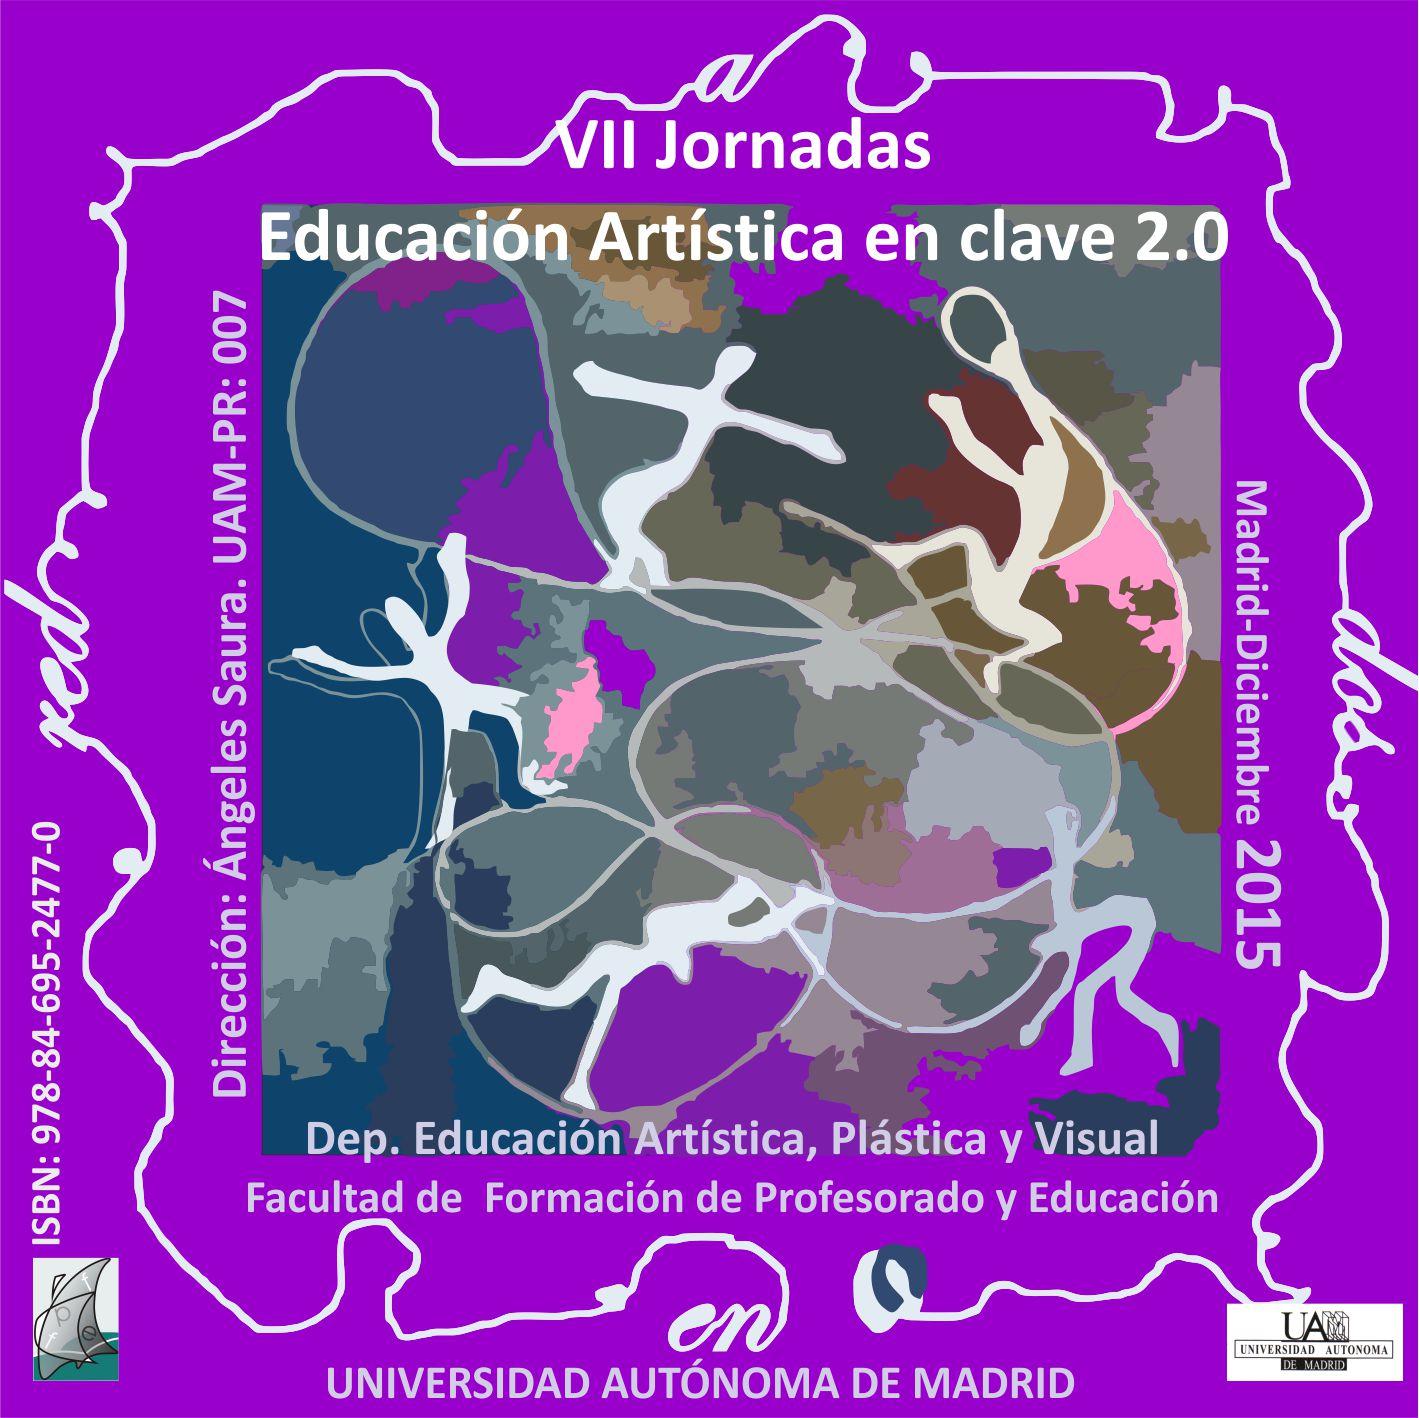 Publicadas ACTAS: ISBN13: 978-84-695-2477-0